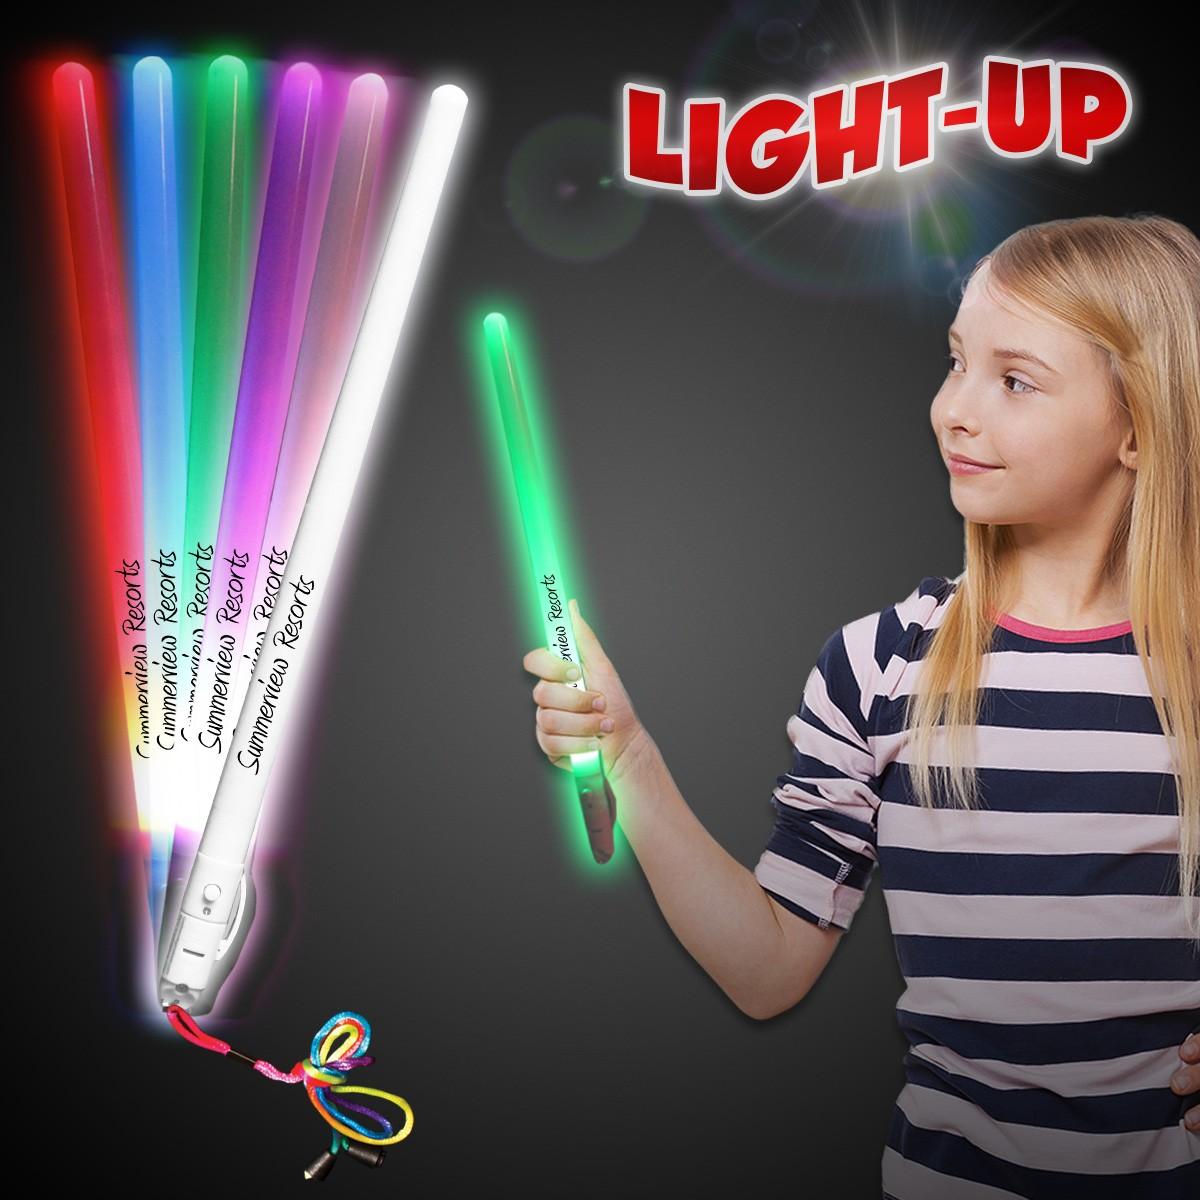 11 INCH LIGHT STICKS